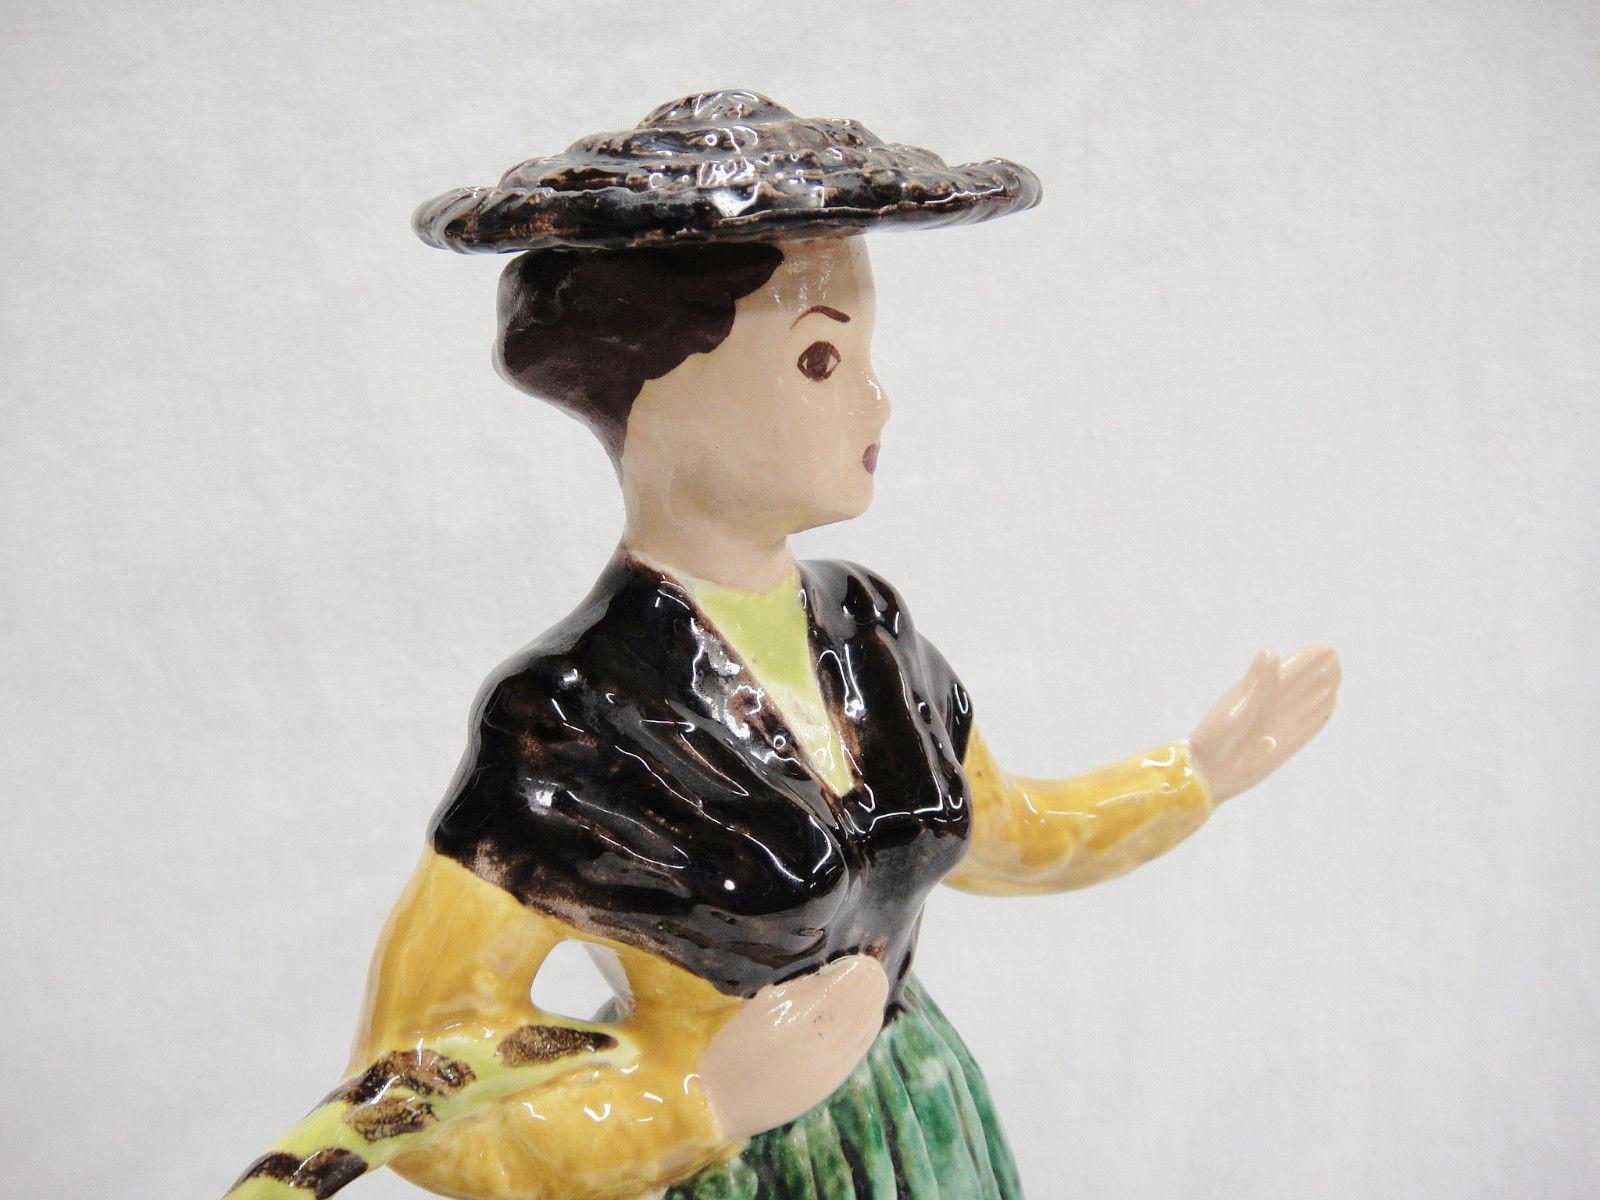 hedi schoop vase of hedi schoop vintage figurine vase woman holding market basket brown with hedi schoop vintage figurine vase woman holding market basket brown green 12 2 of 6 hedi schoop vintage figurine vase